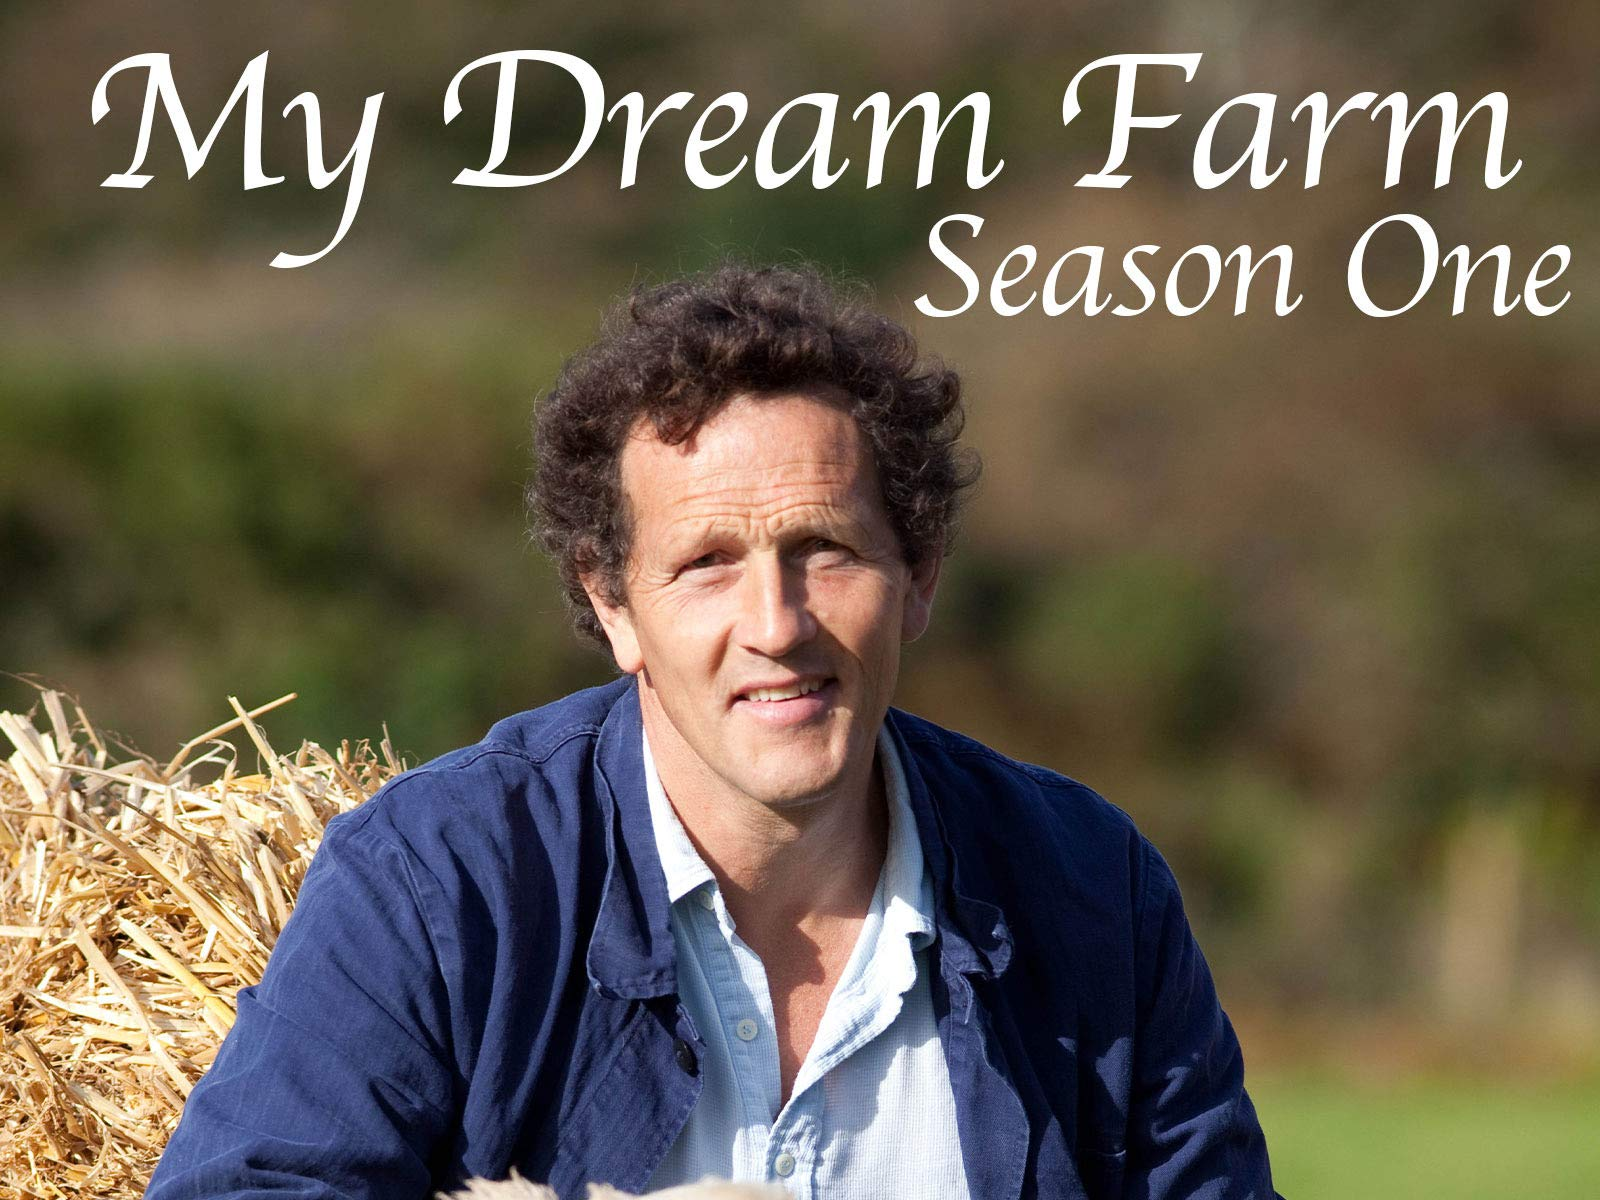 Watch My Dream Farm Prime Video